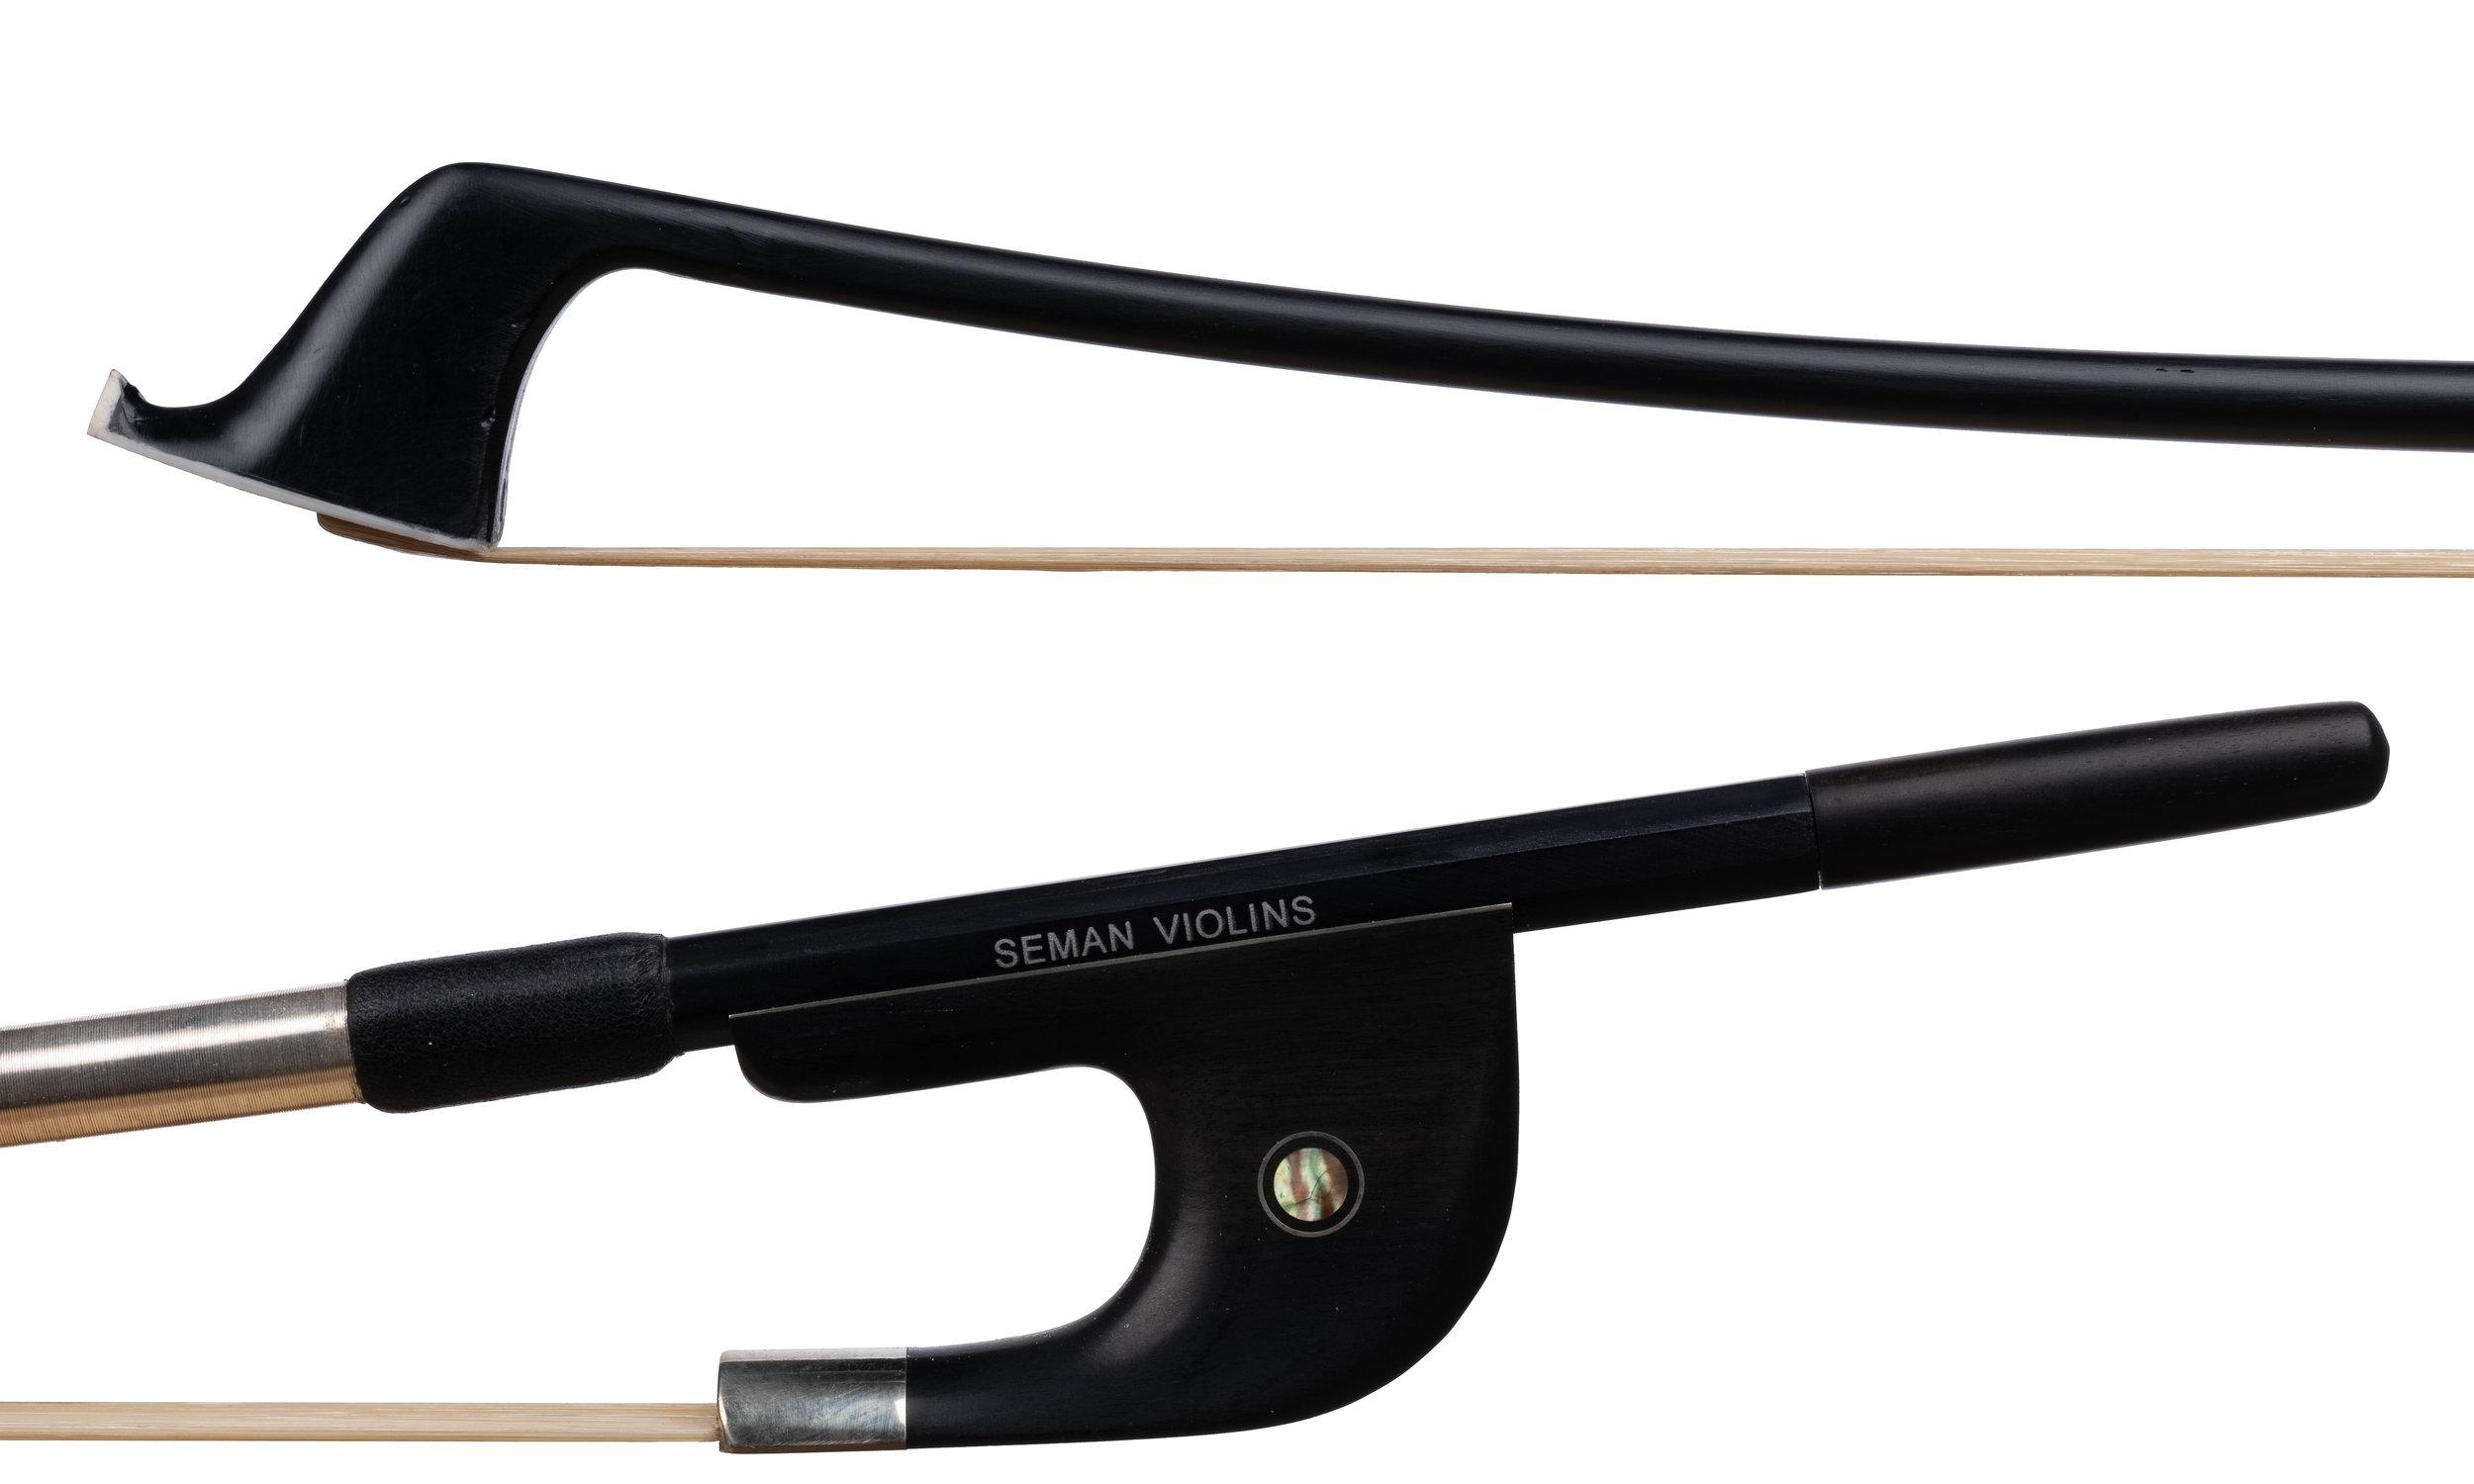 Seman Violins German Bass Bow.jpg